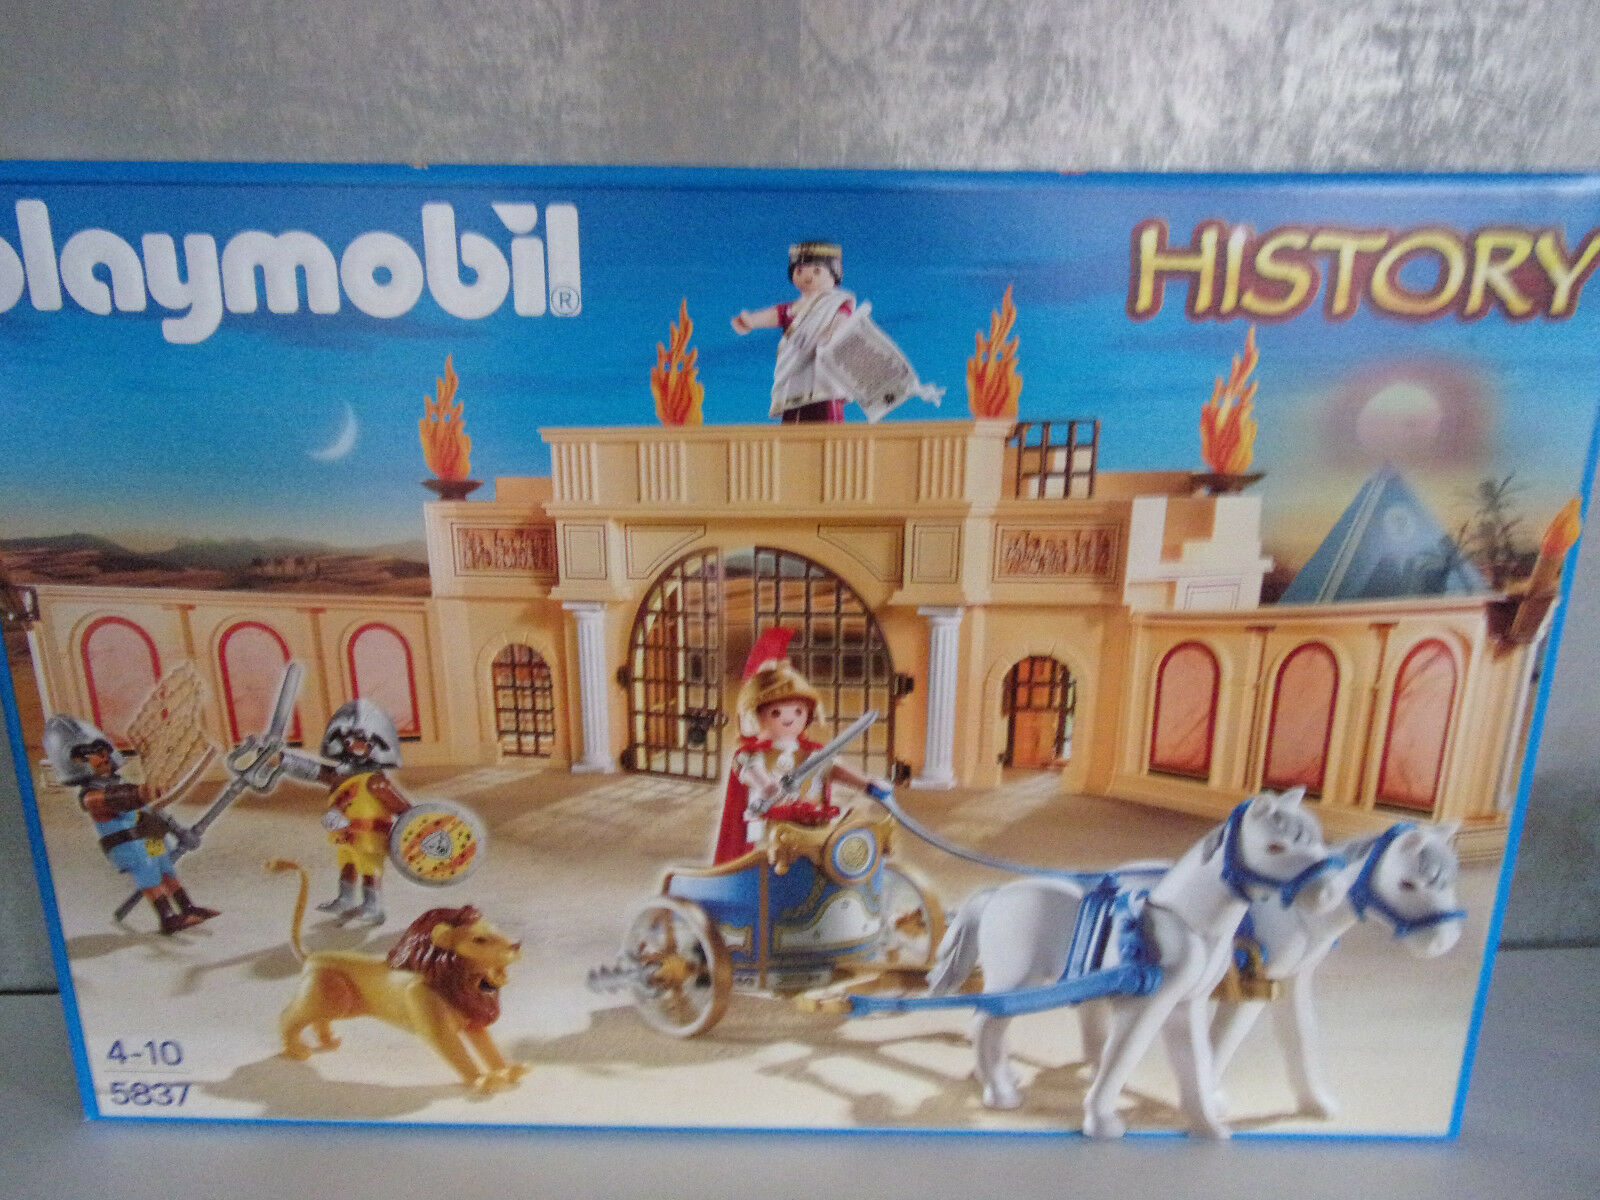 Playmobil Histoire 5837 Romain wettkampfarena - Neuf et emballage d'origine